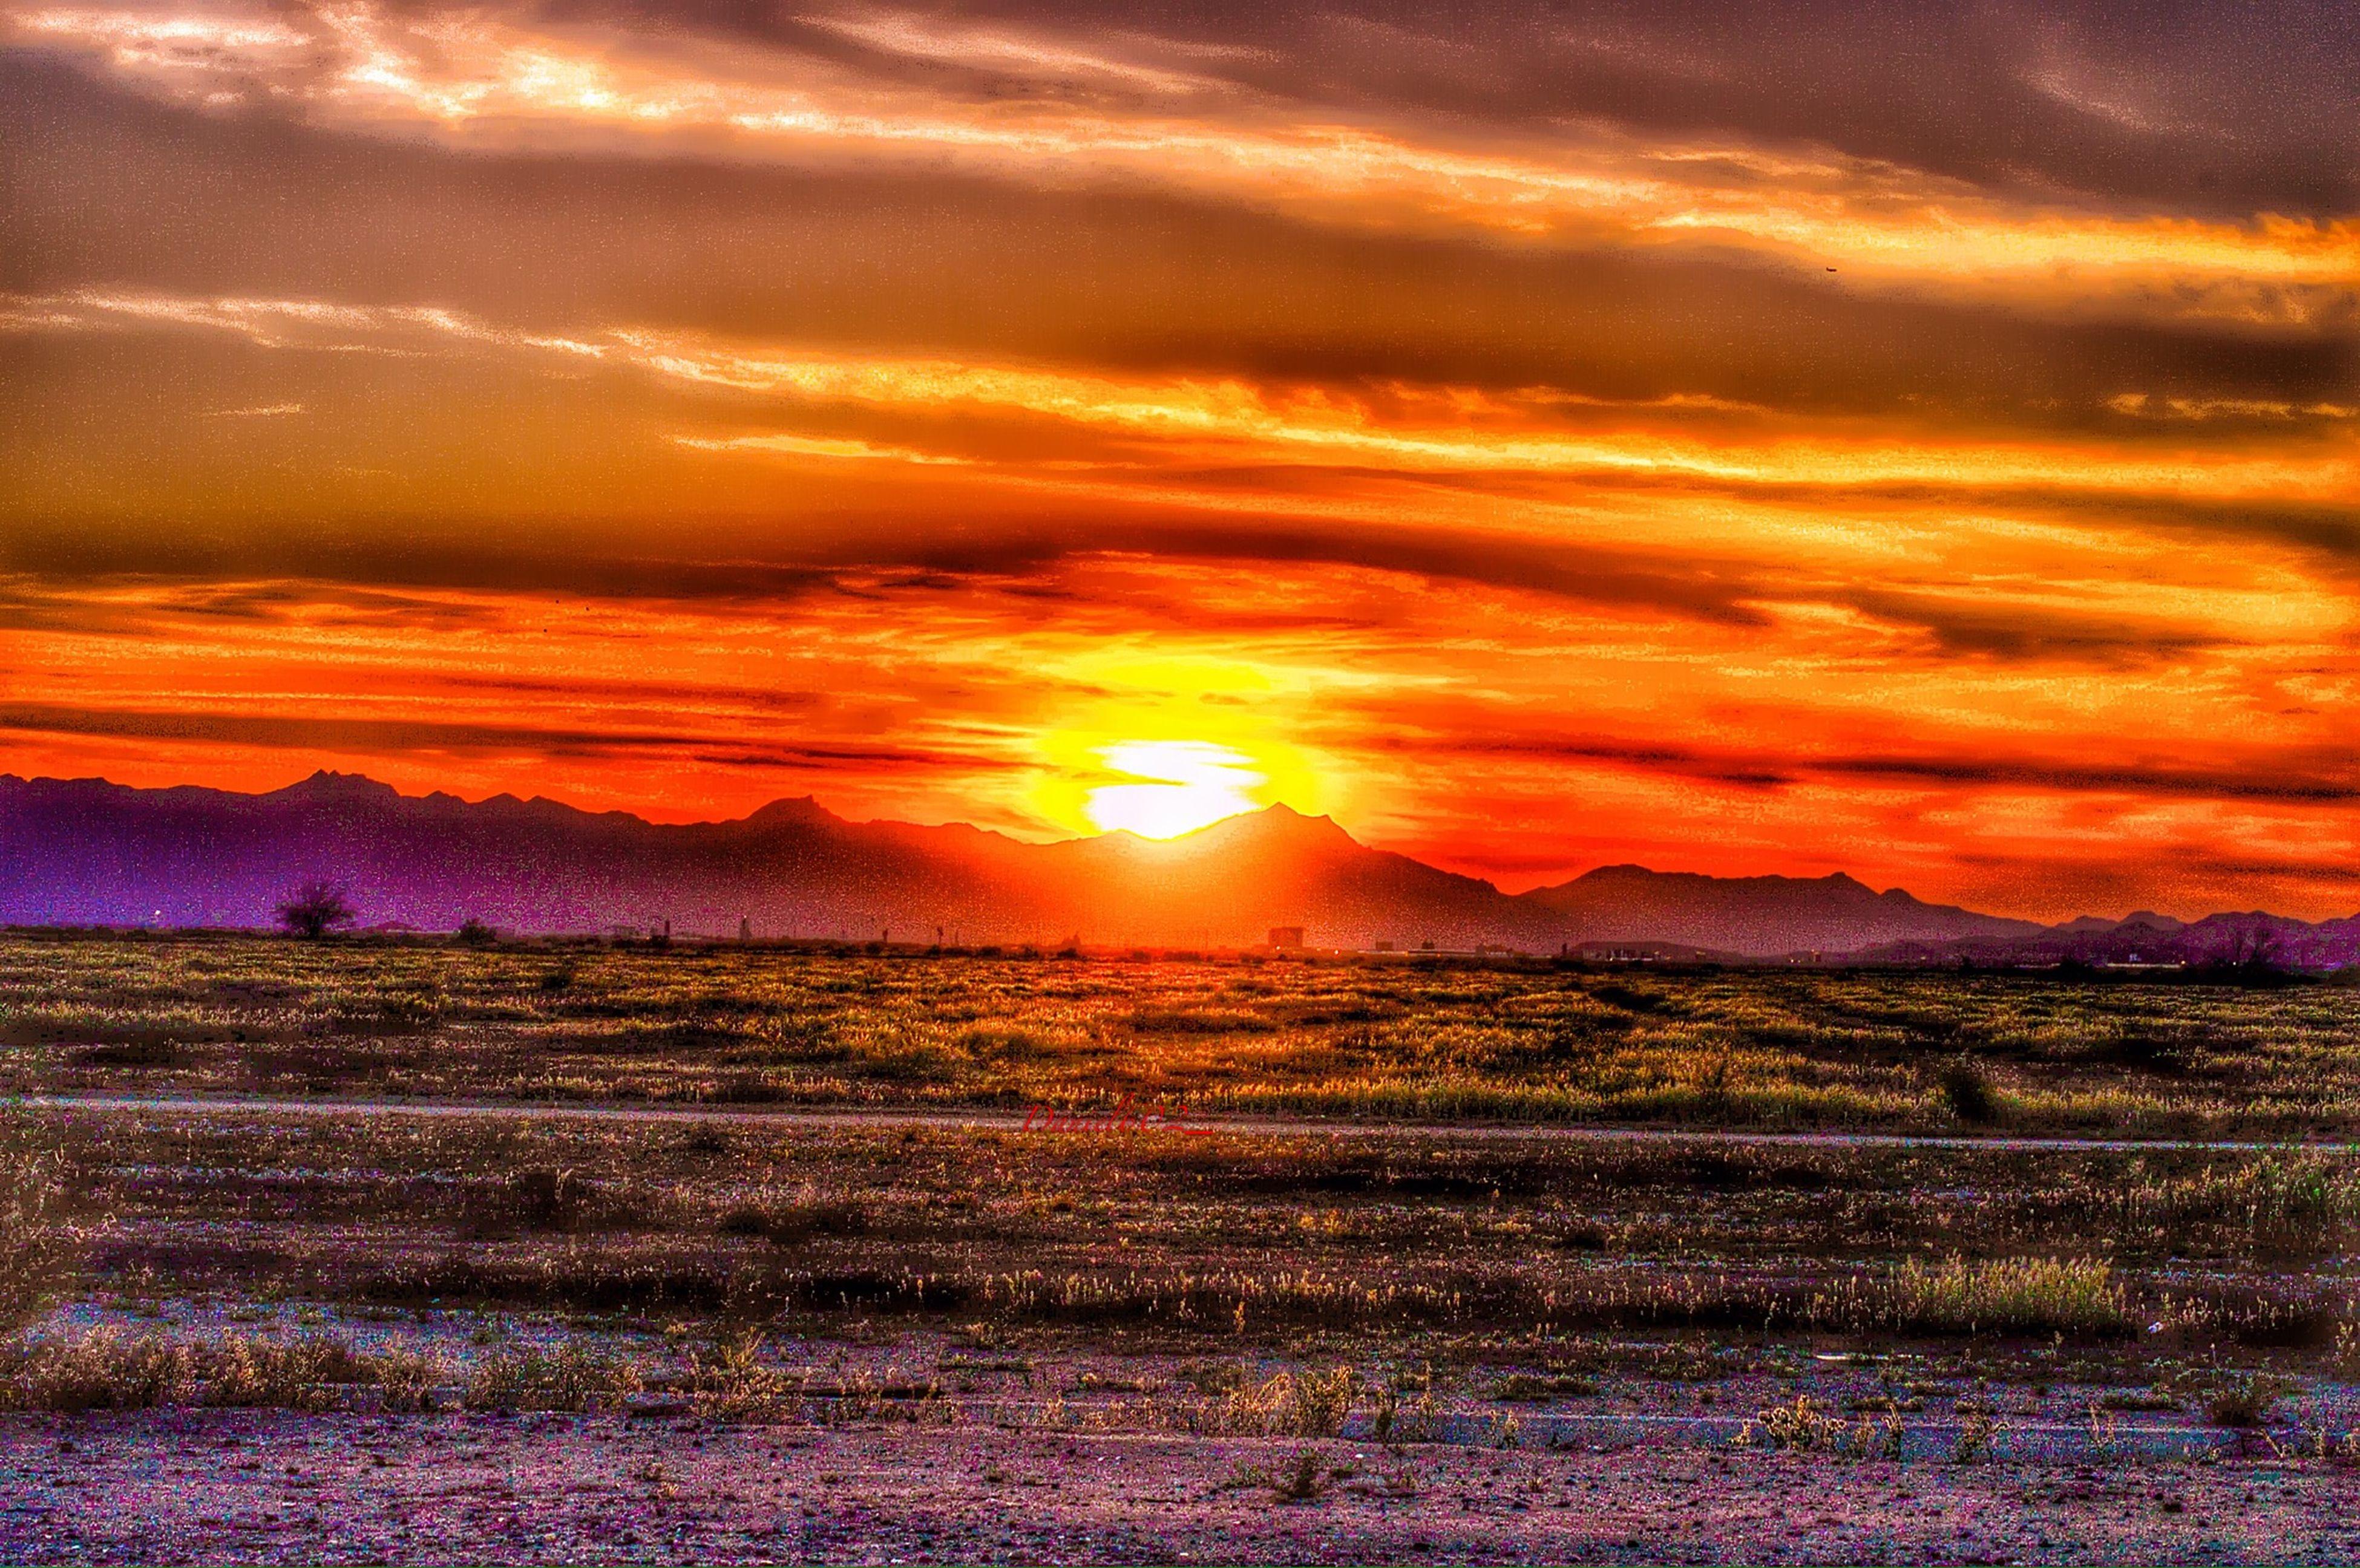 sunset, orange color, scenics, tranquil scene, sun, sky, tranquility, beauty in nature, cloud - sky, landscape, idyllic, nature, dramatic sky, field, cloudy, sunlight, cloud, non-urban scene, remote, sunbeam